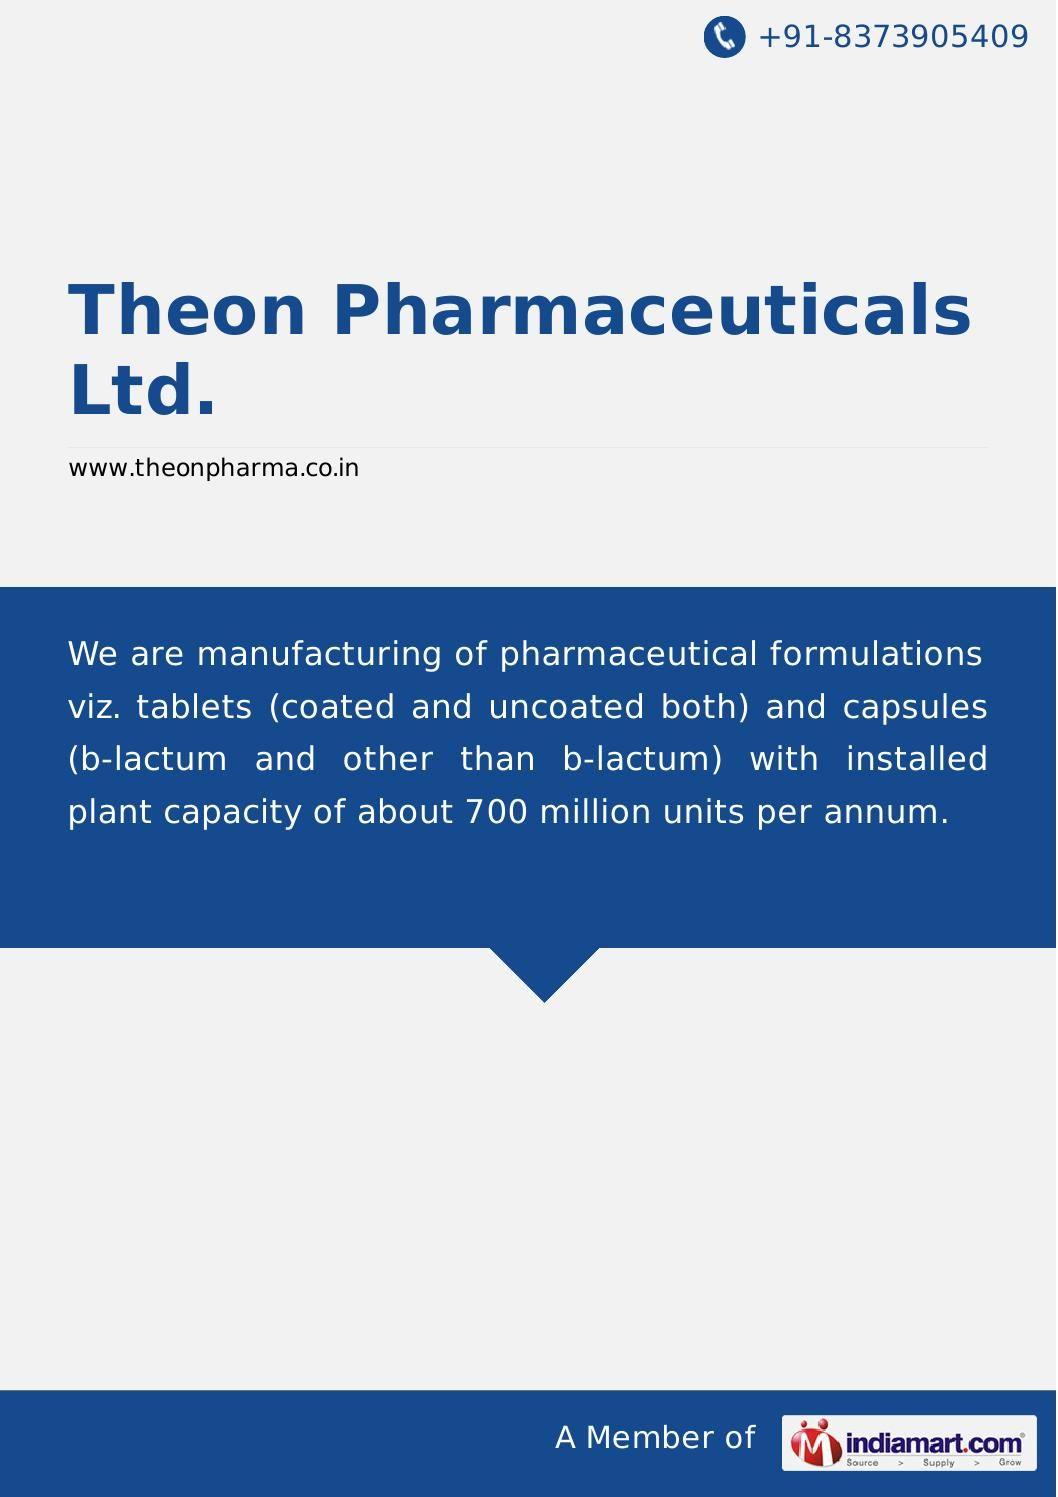 Theon Pharmaceuticals Ltd Premier Health Health Care The Unit